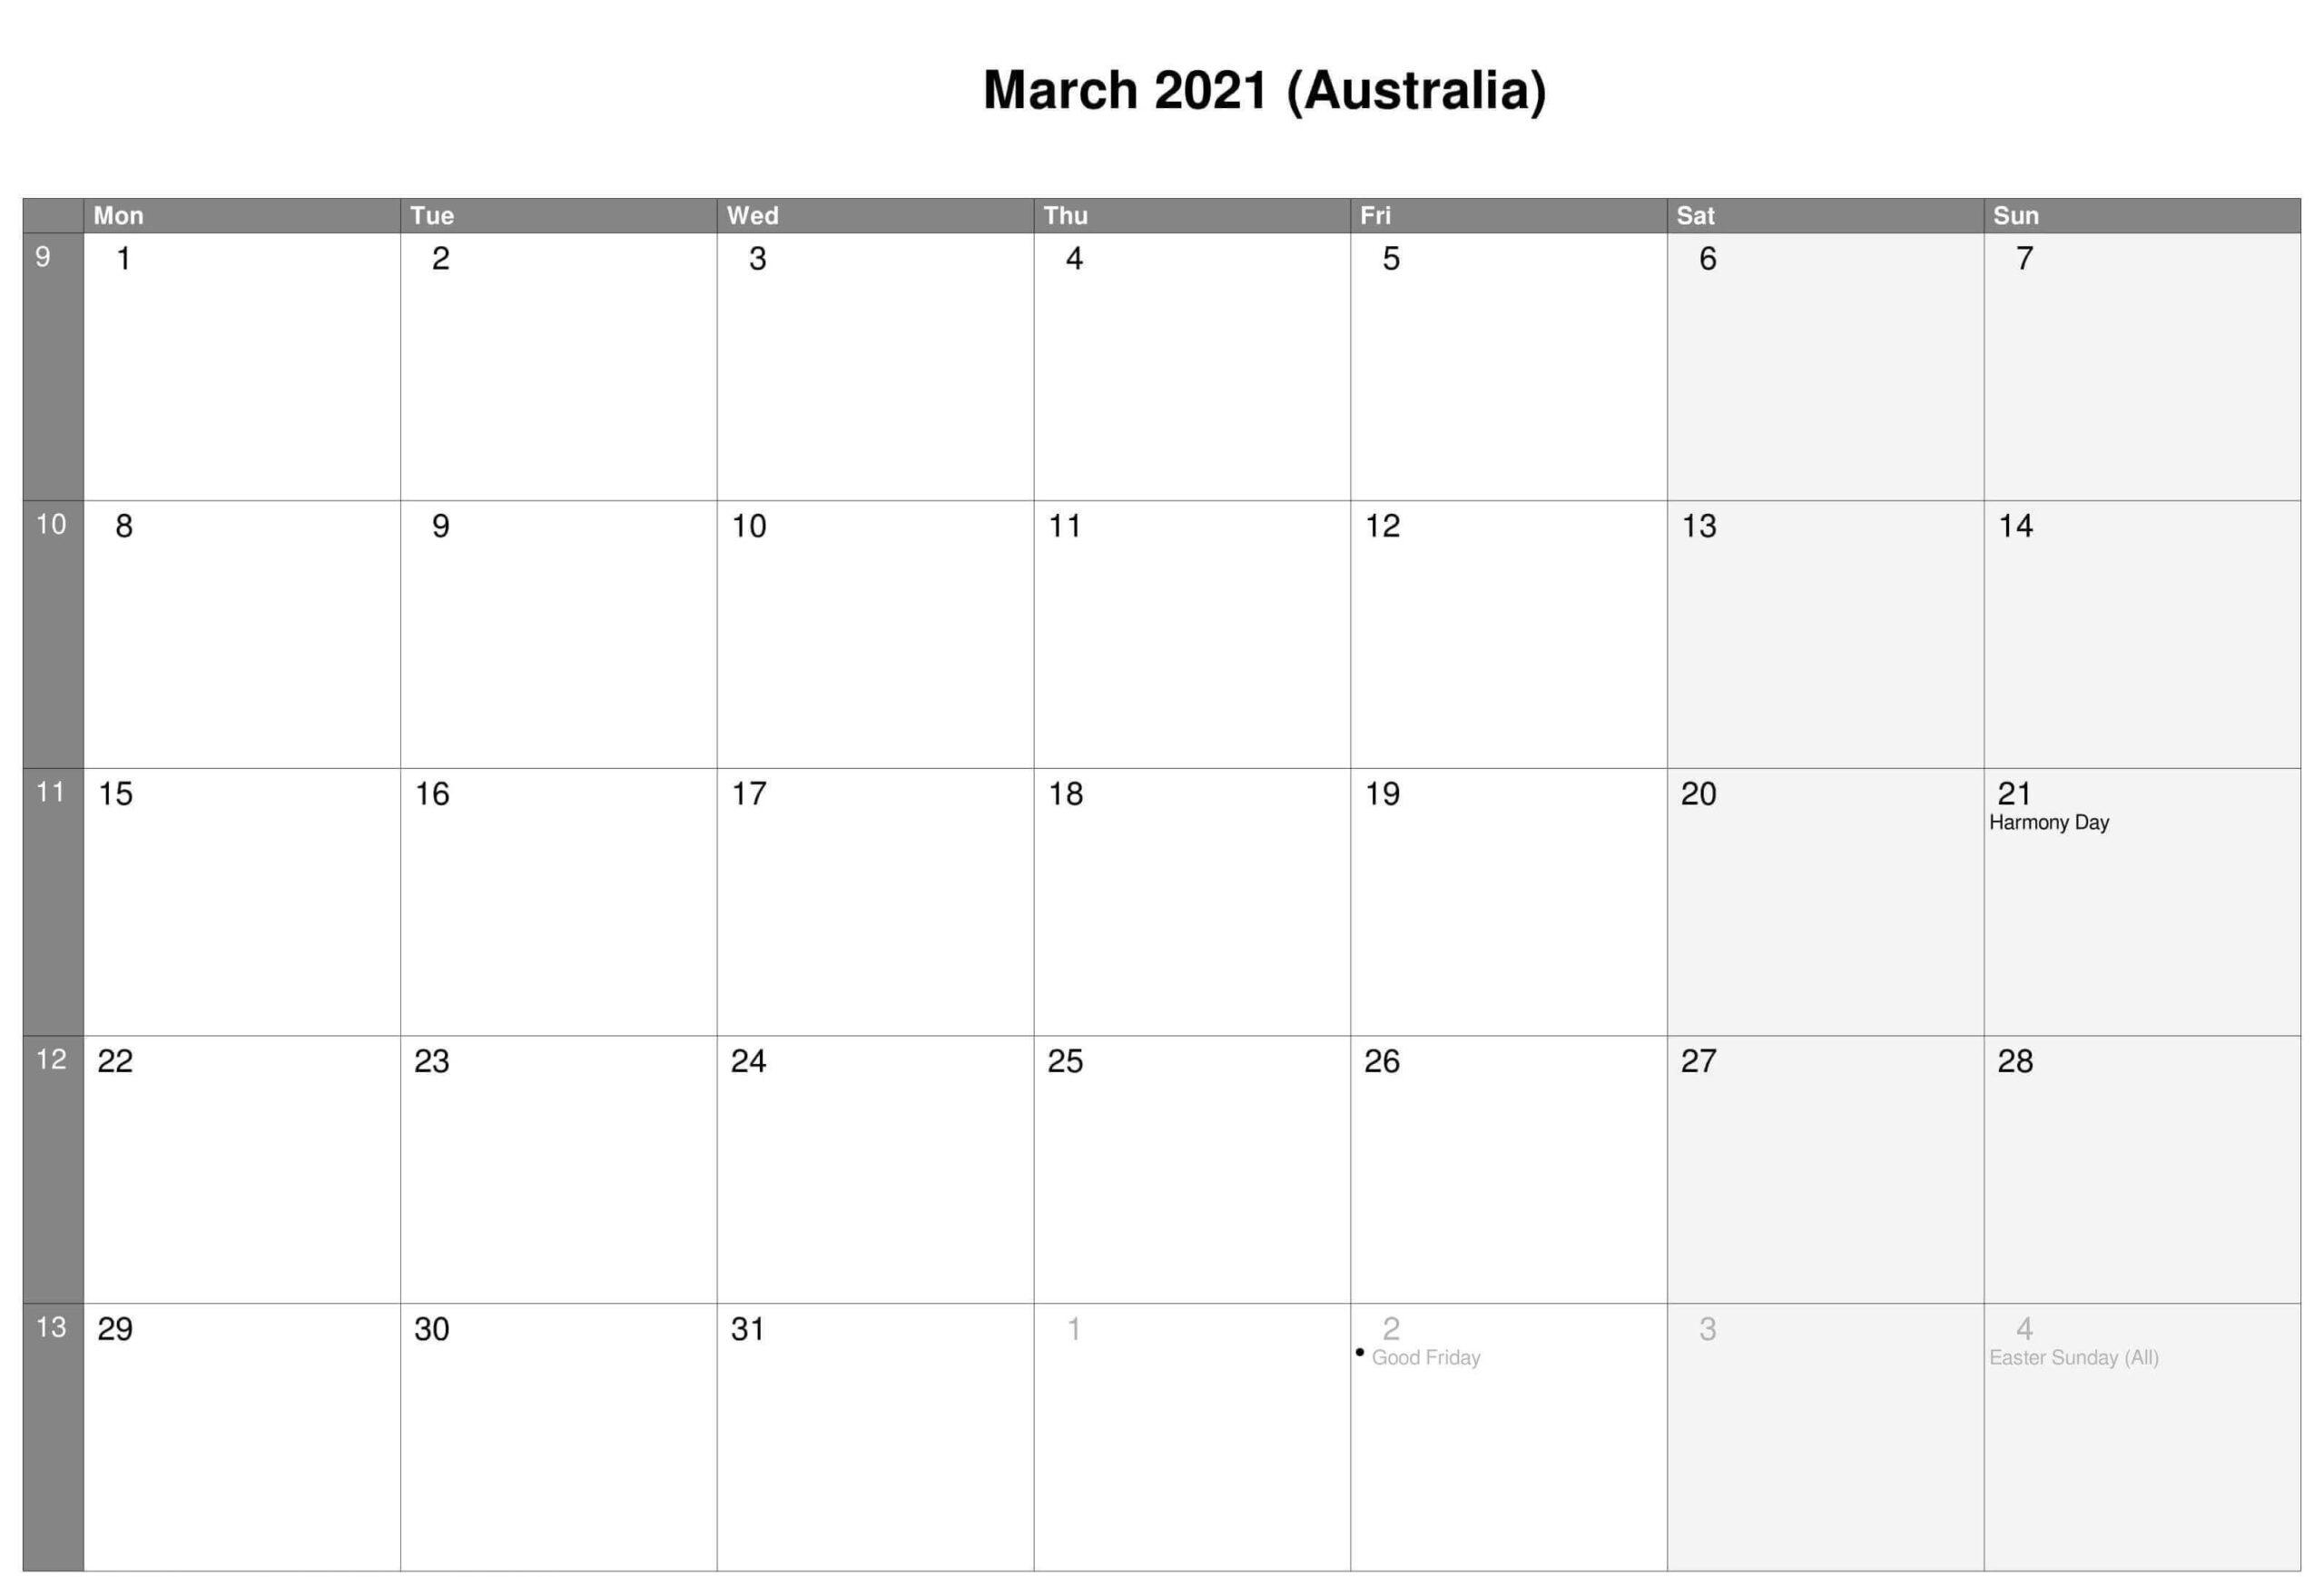 March Australia Holidays Calendar 2021